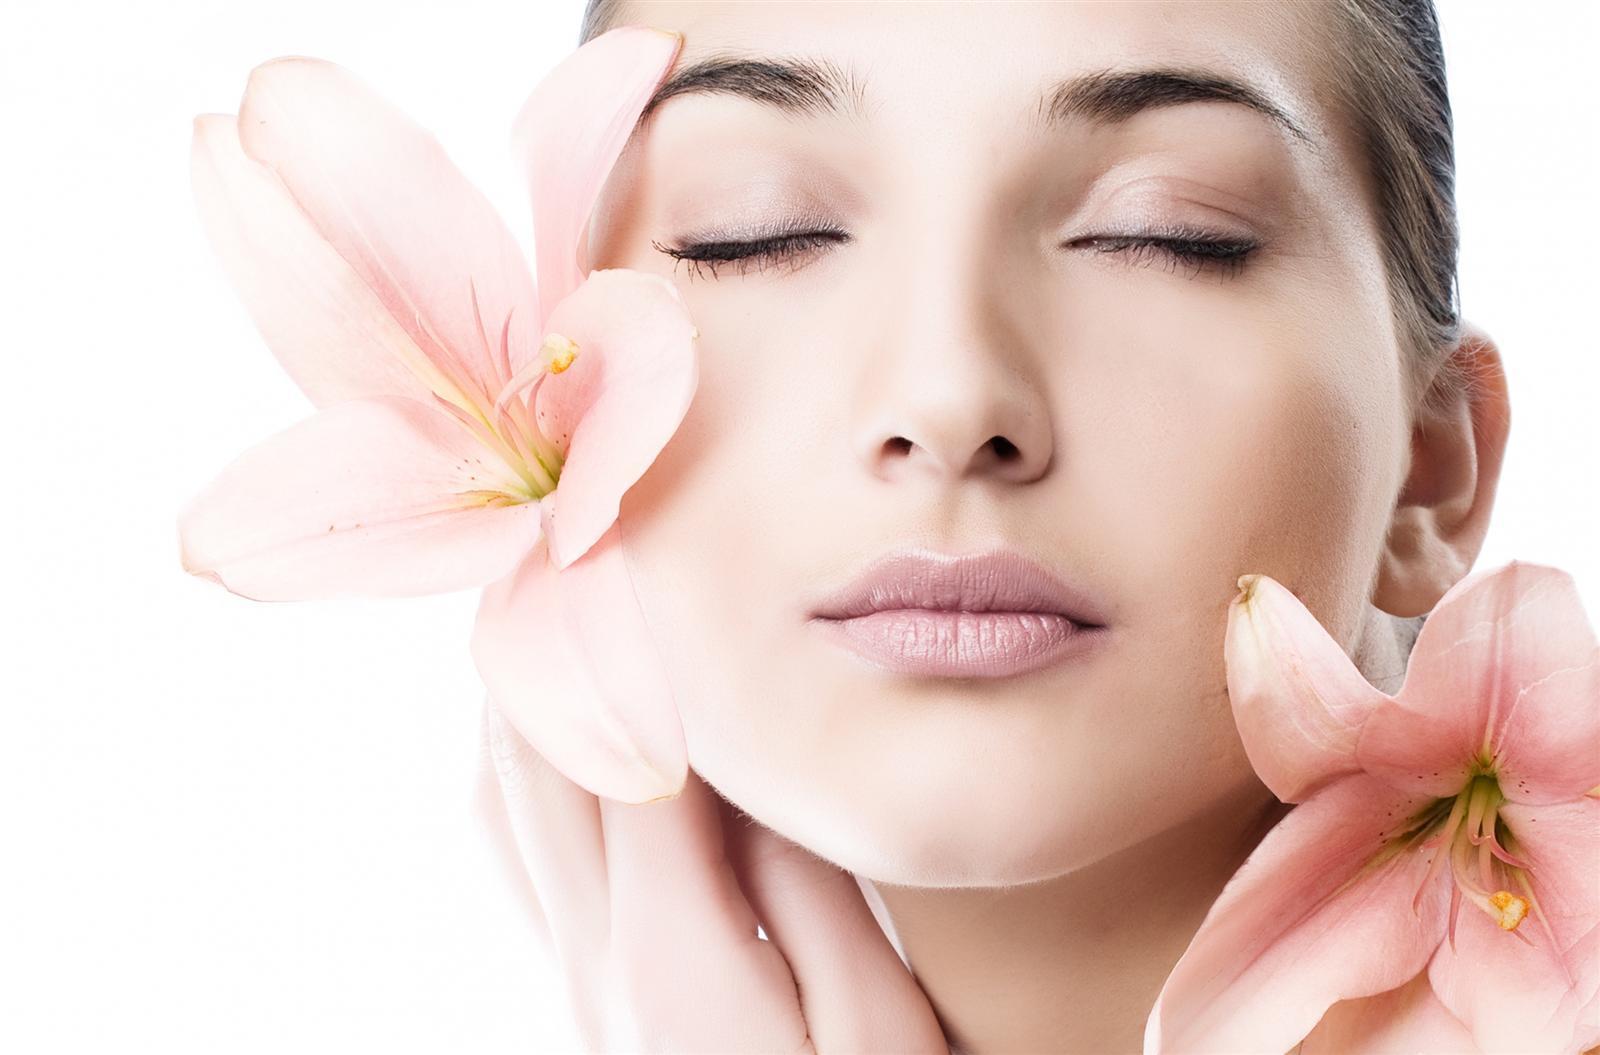 Southern Cosmetic Laser Skin Rejuvenation